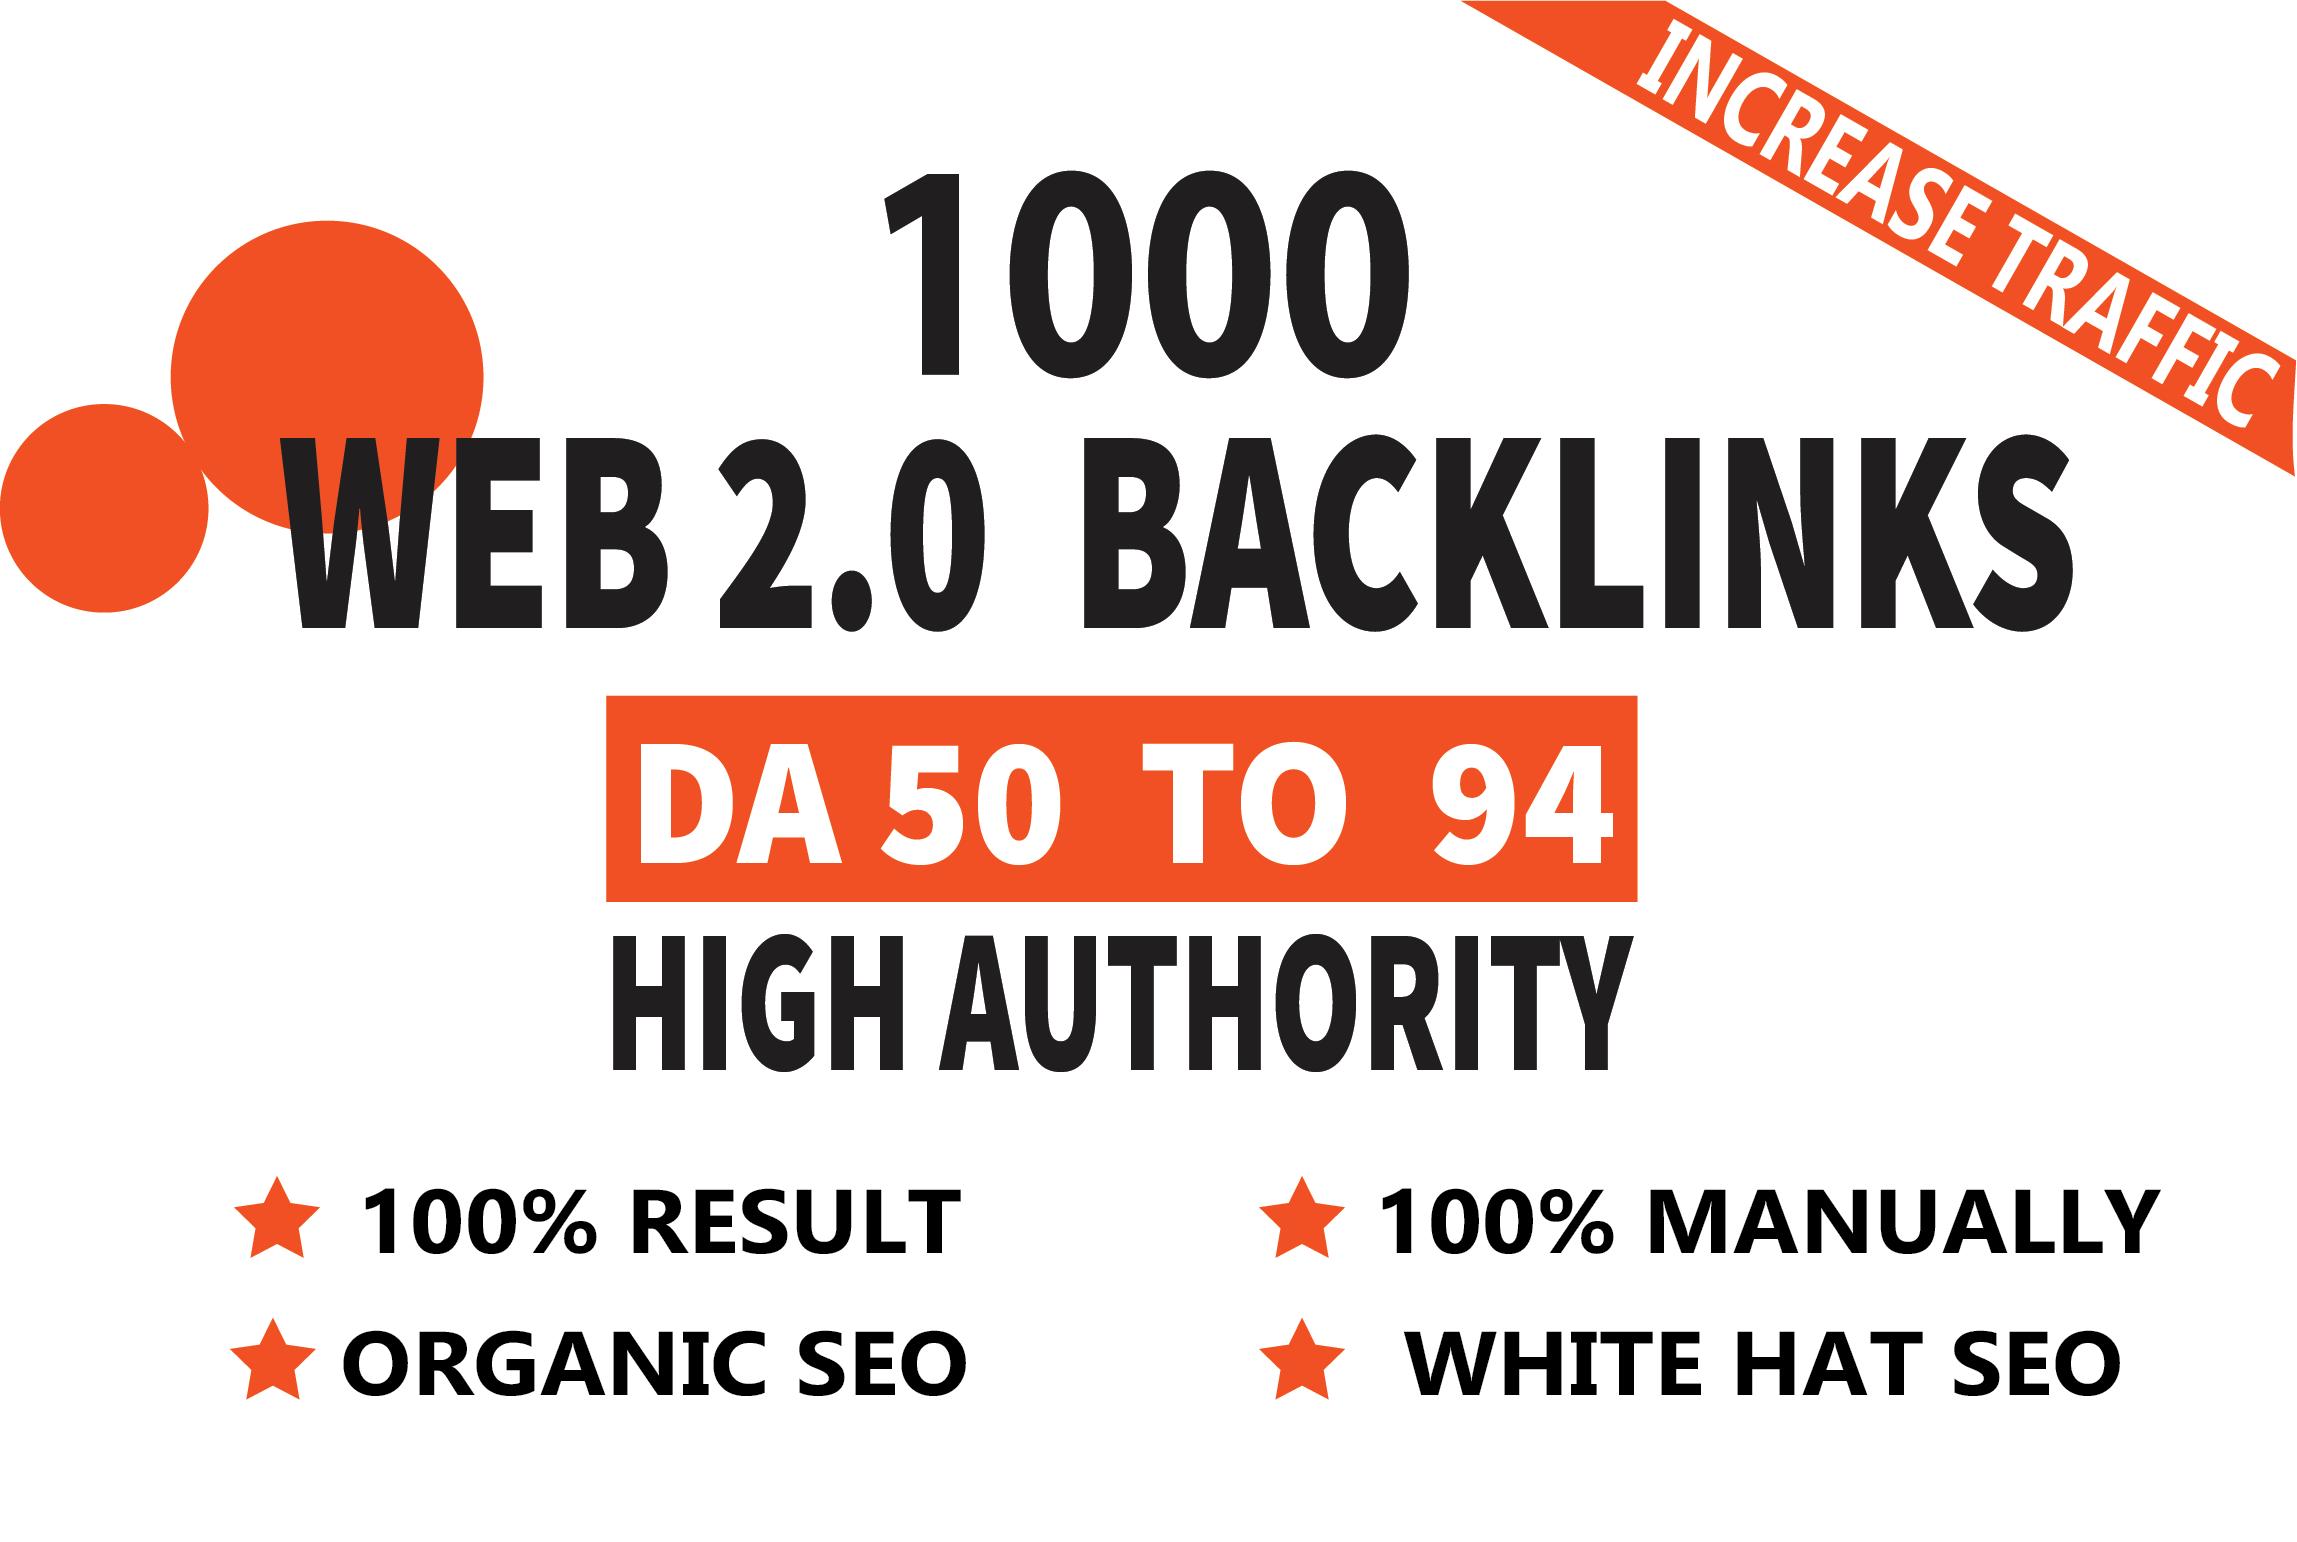 Get 1000 Web 2.0 High Quality Backlinks